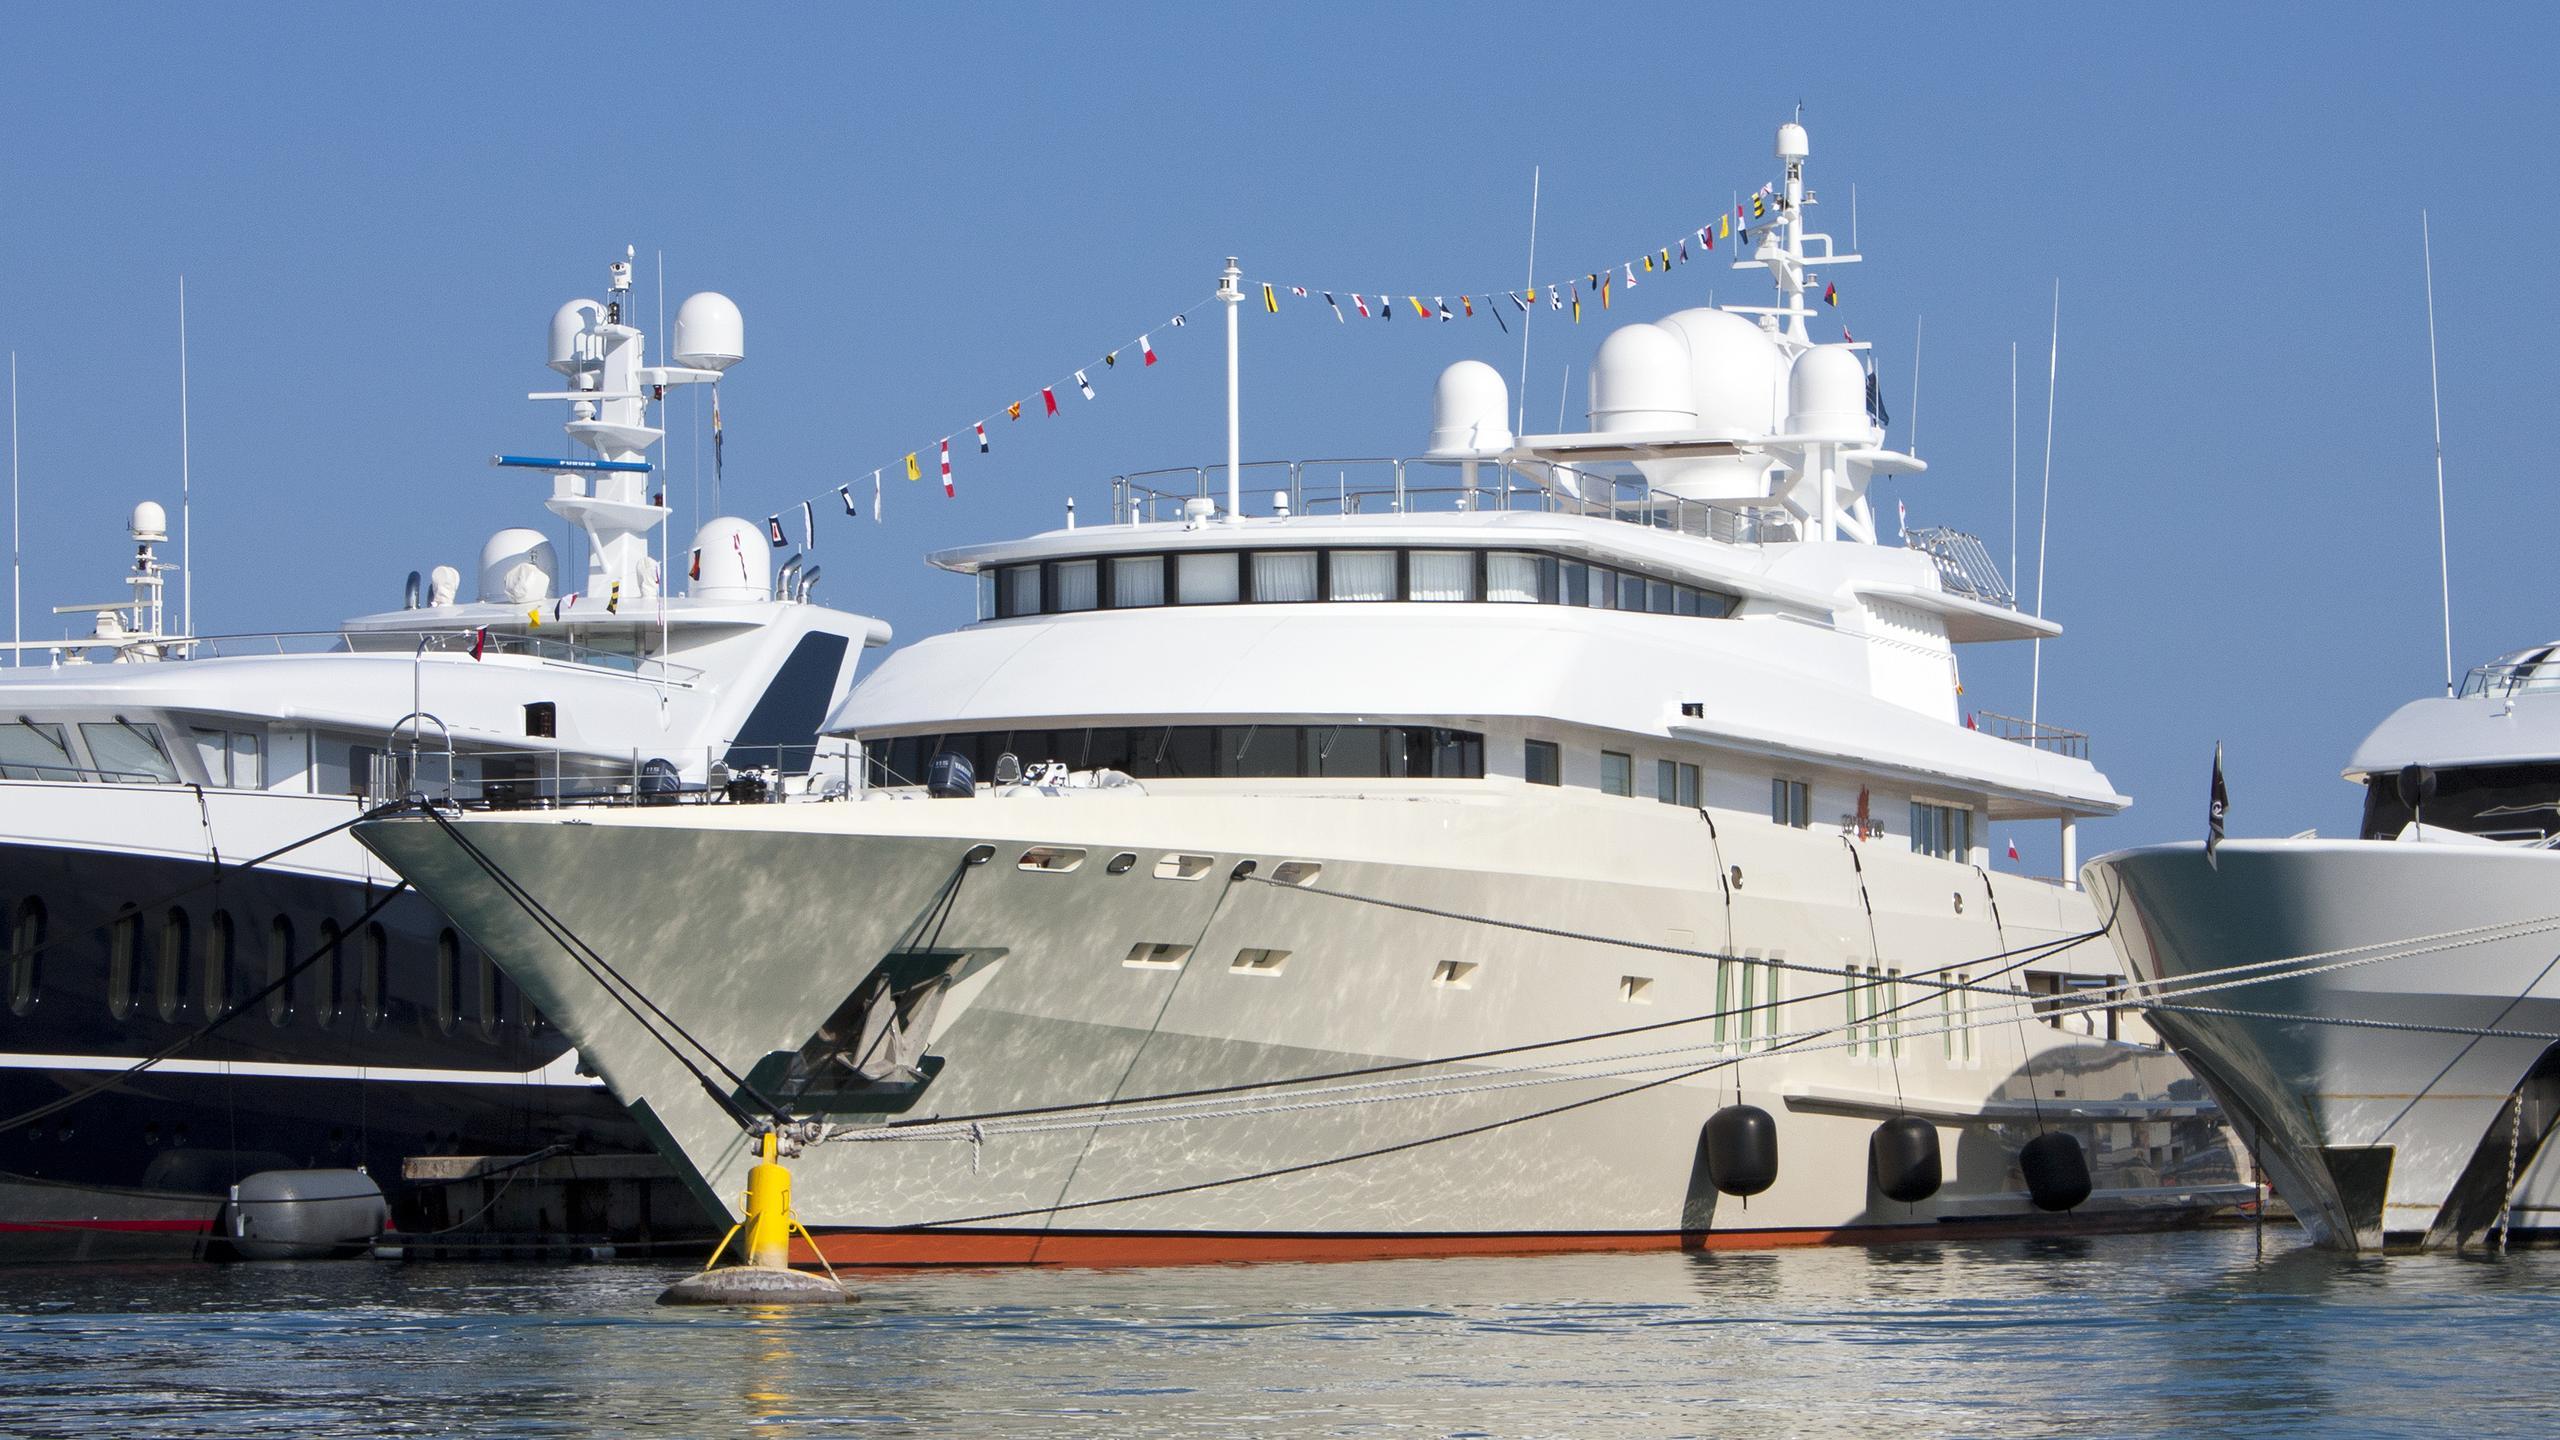 coral-island-motor-yacht-lurssen-1994-73m-half-profile